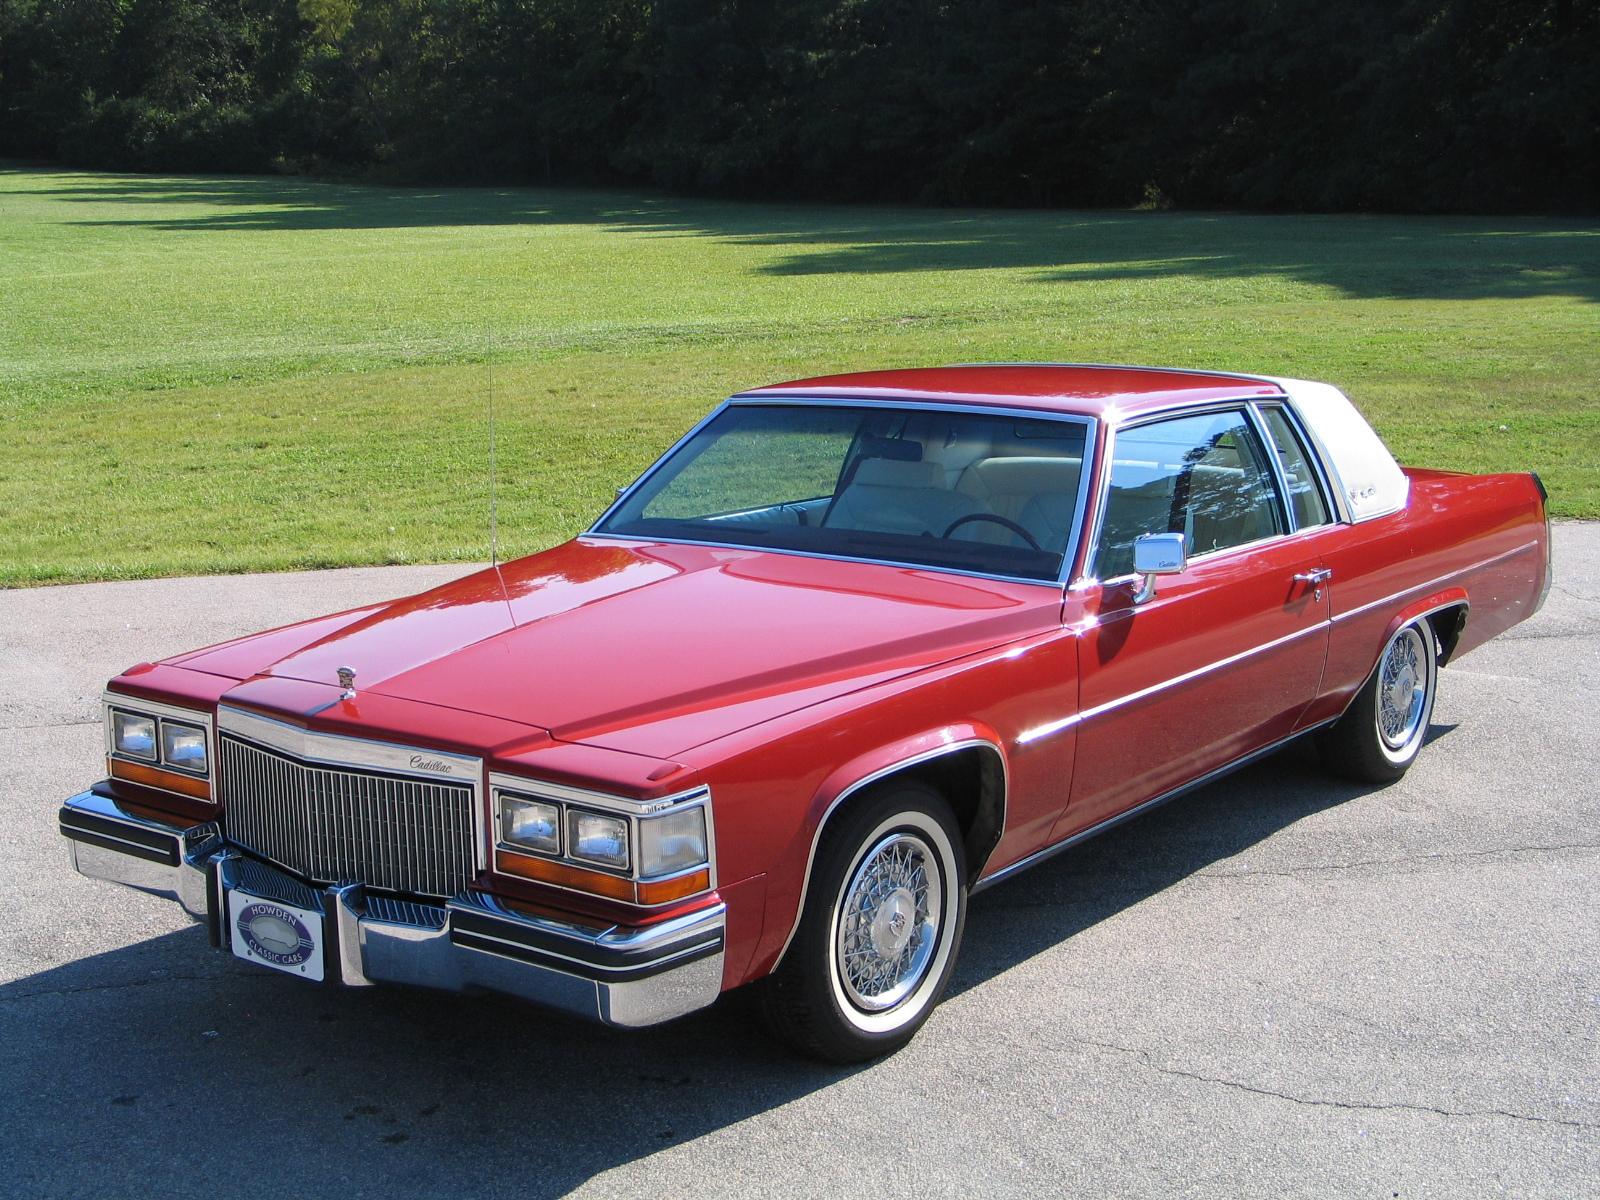 File:1980 Cadillac Coupe Deville fvl2.jpg - Wikimedia Commons